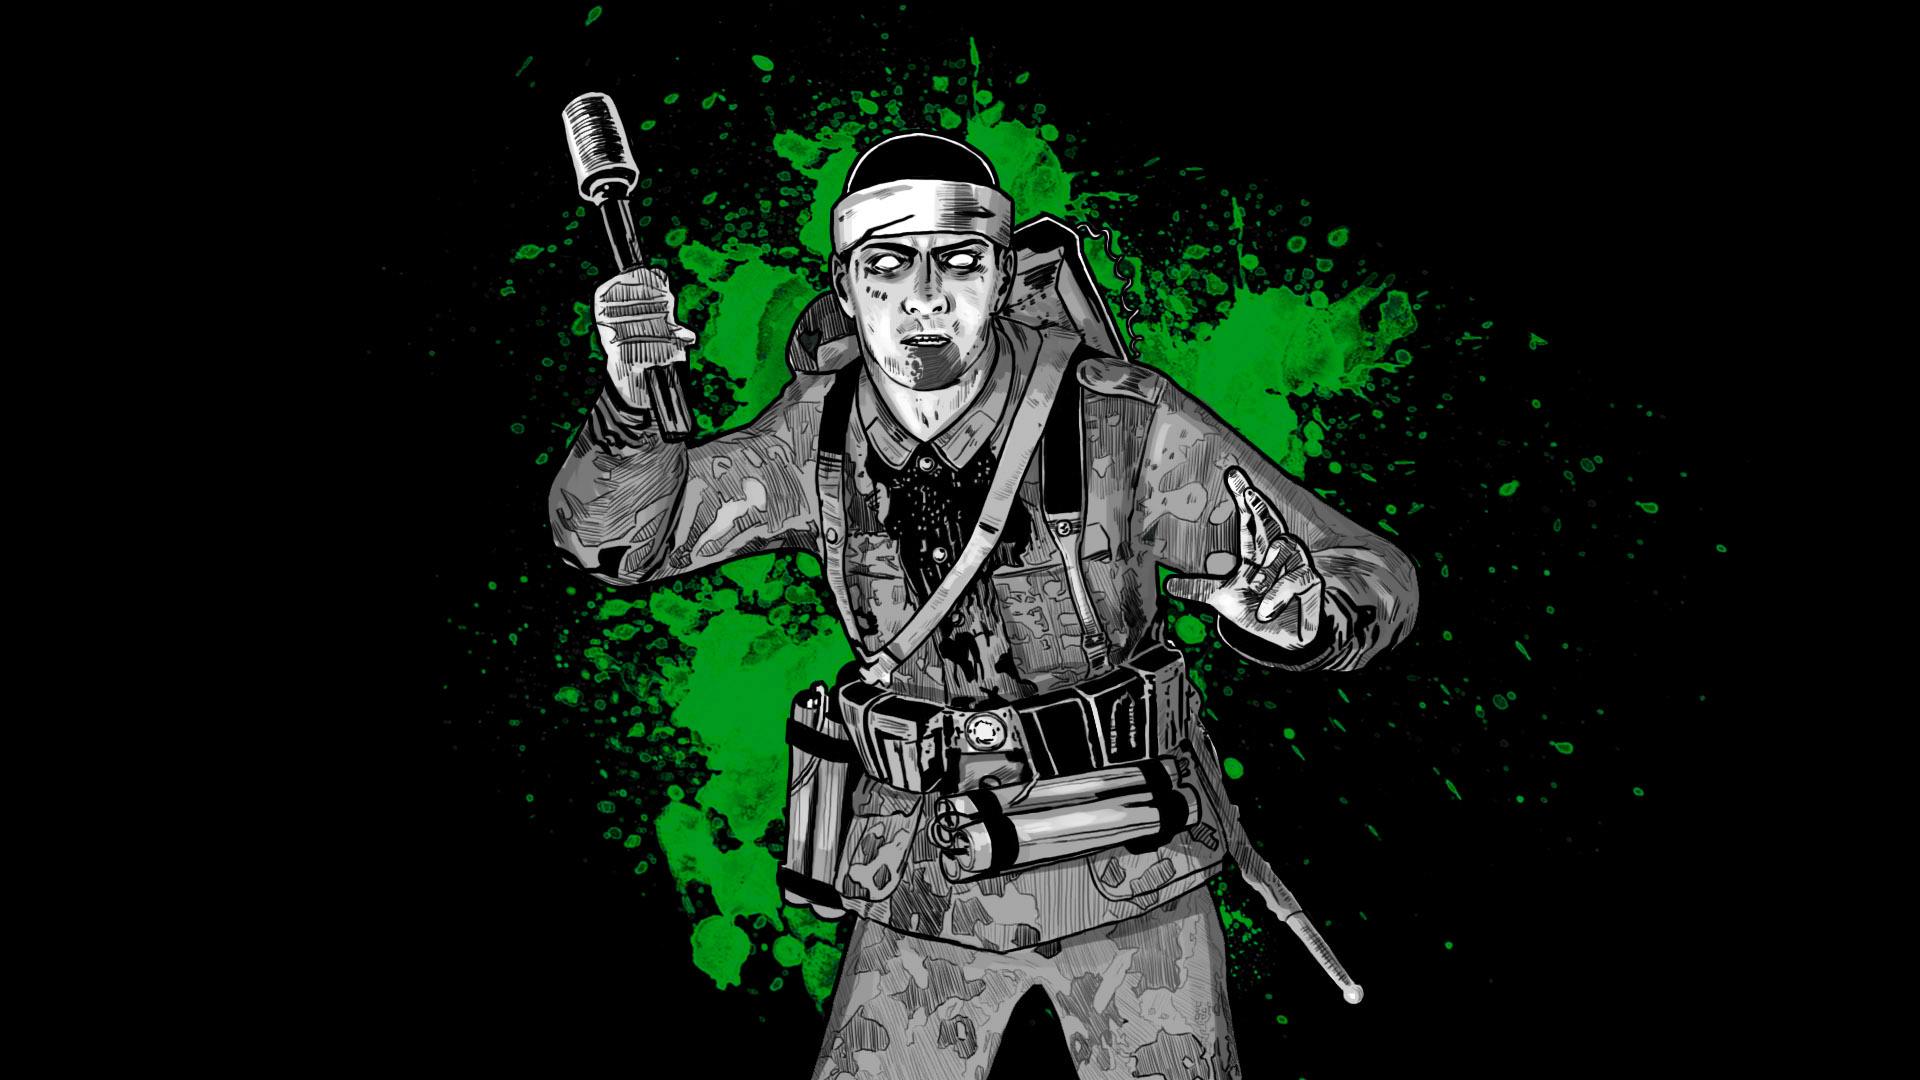 Sniper Elite Nazi Zombie Army Artwork 5.jpg